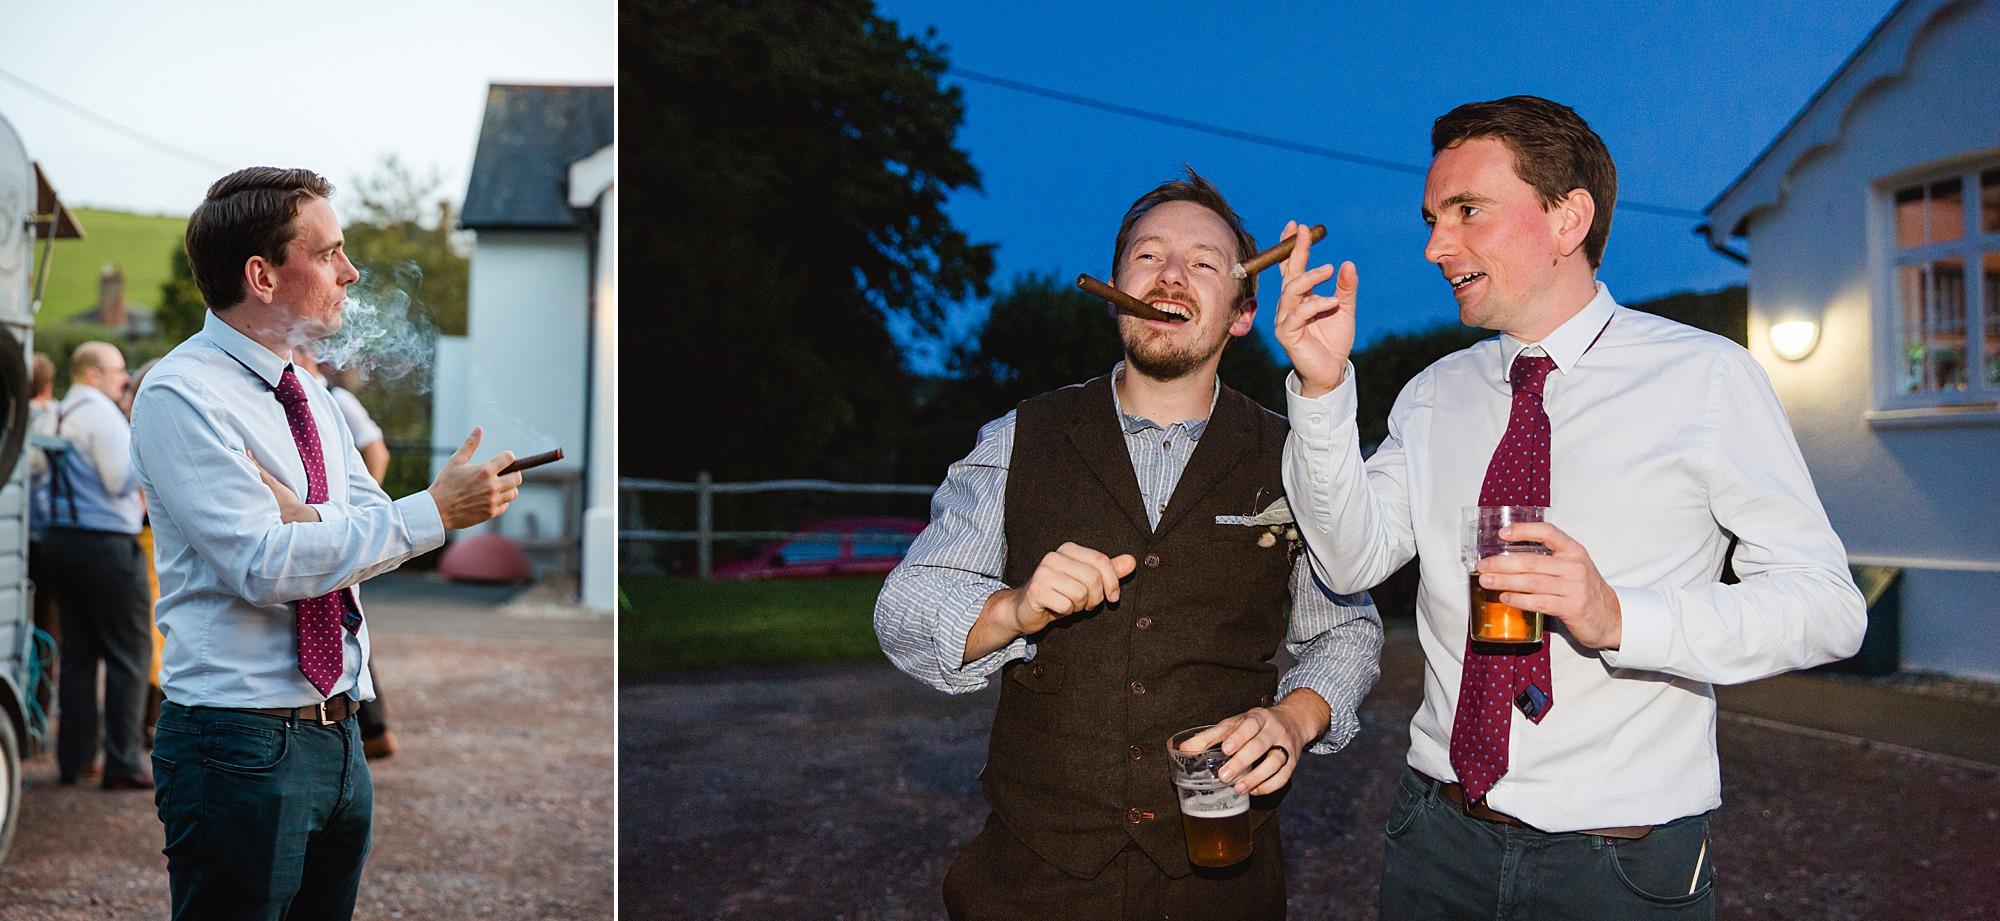 Fun village hall wedding groom and friends smoke cigars together